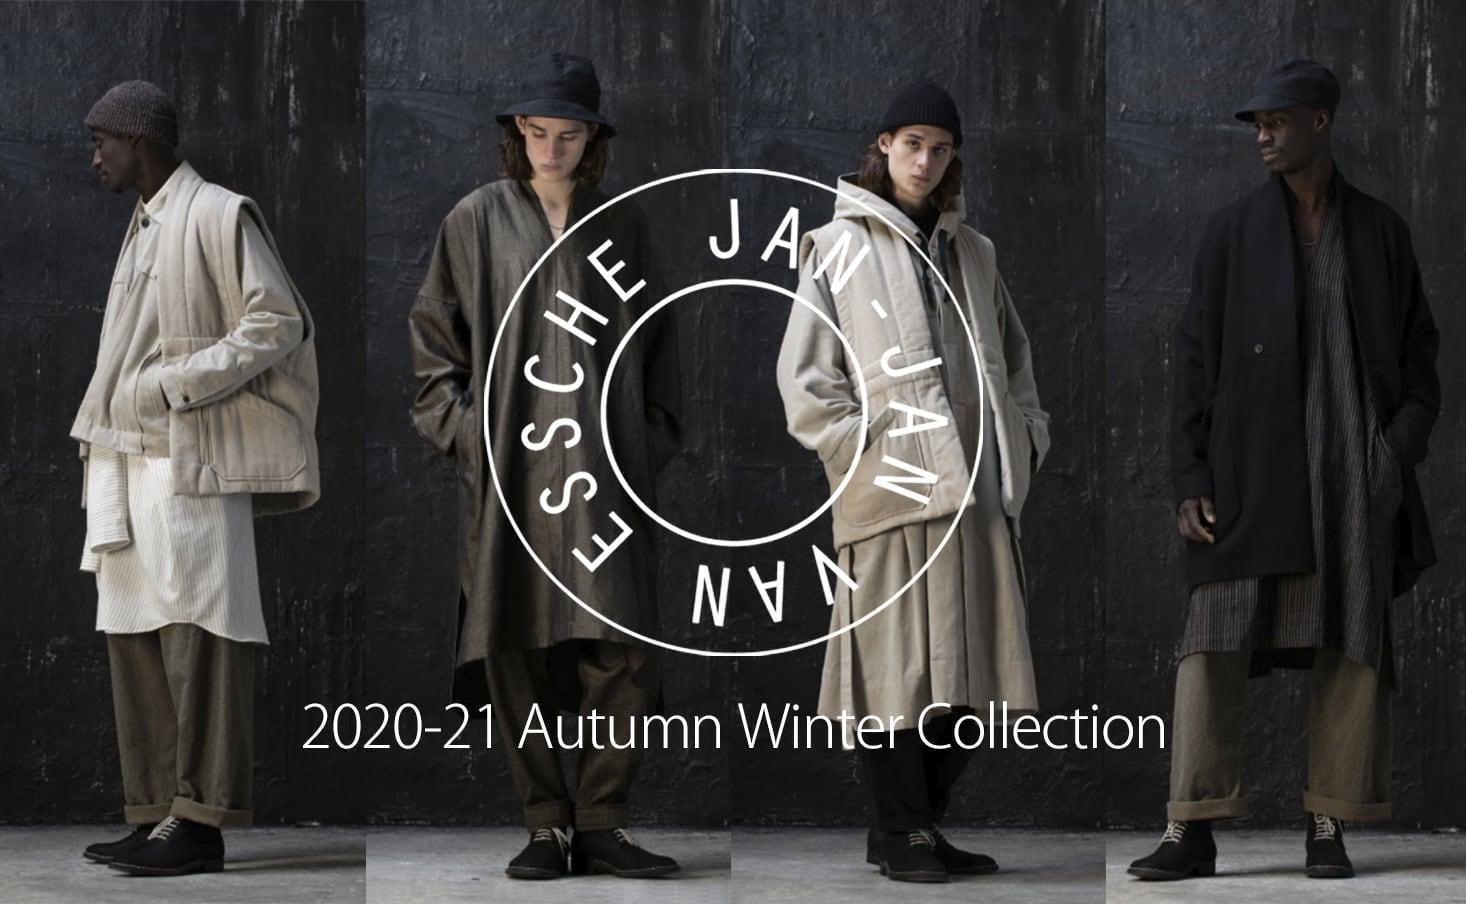 JAN JAN VAN ESSCHE 2020-21AW collection